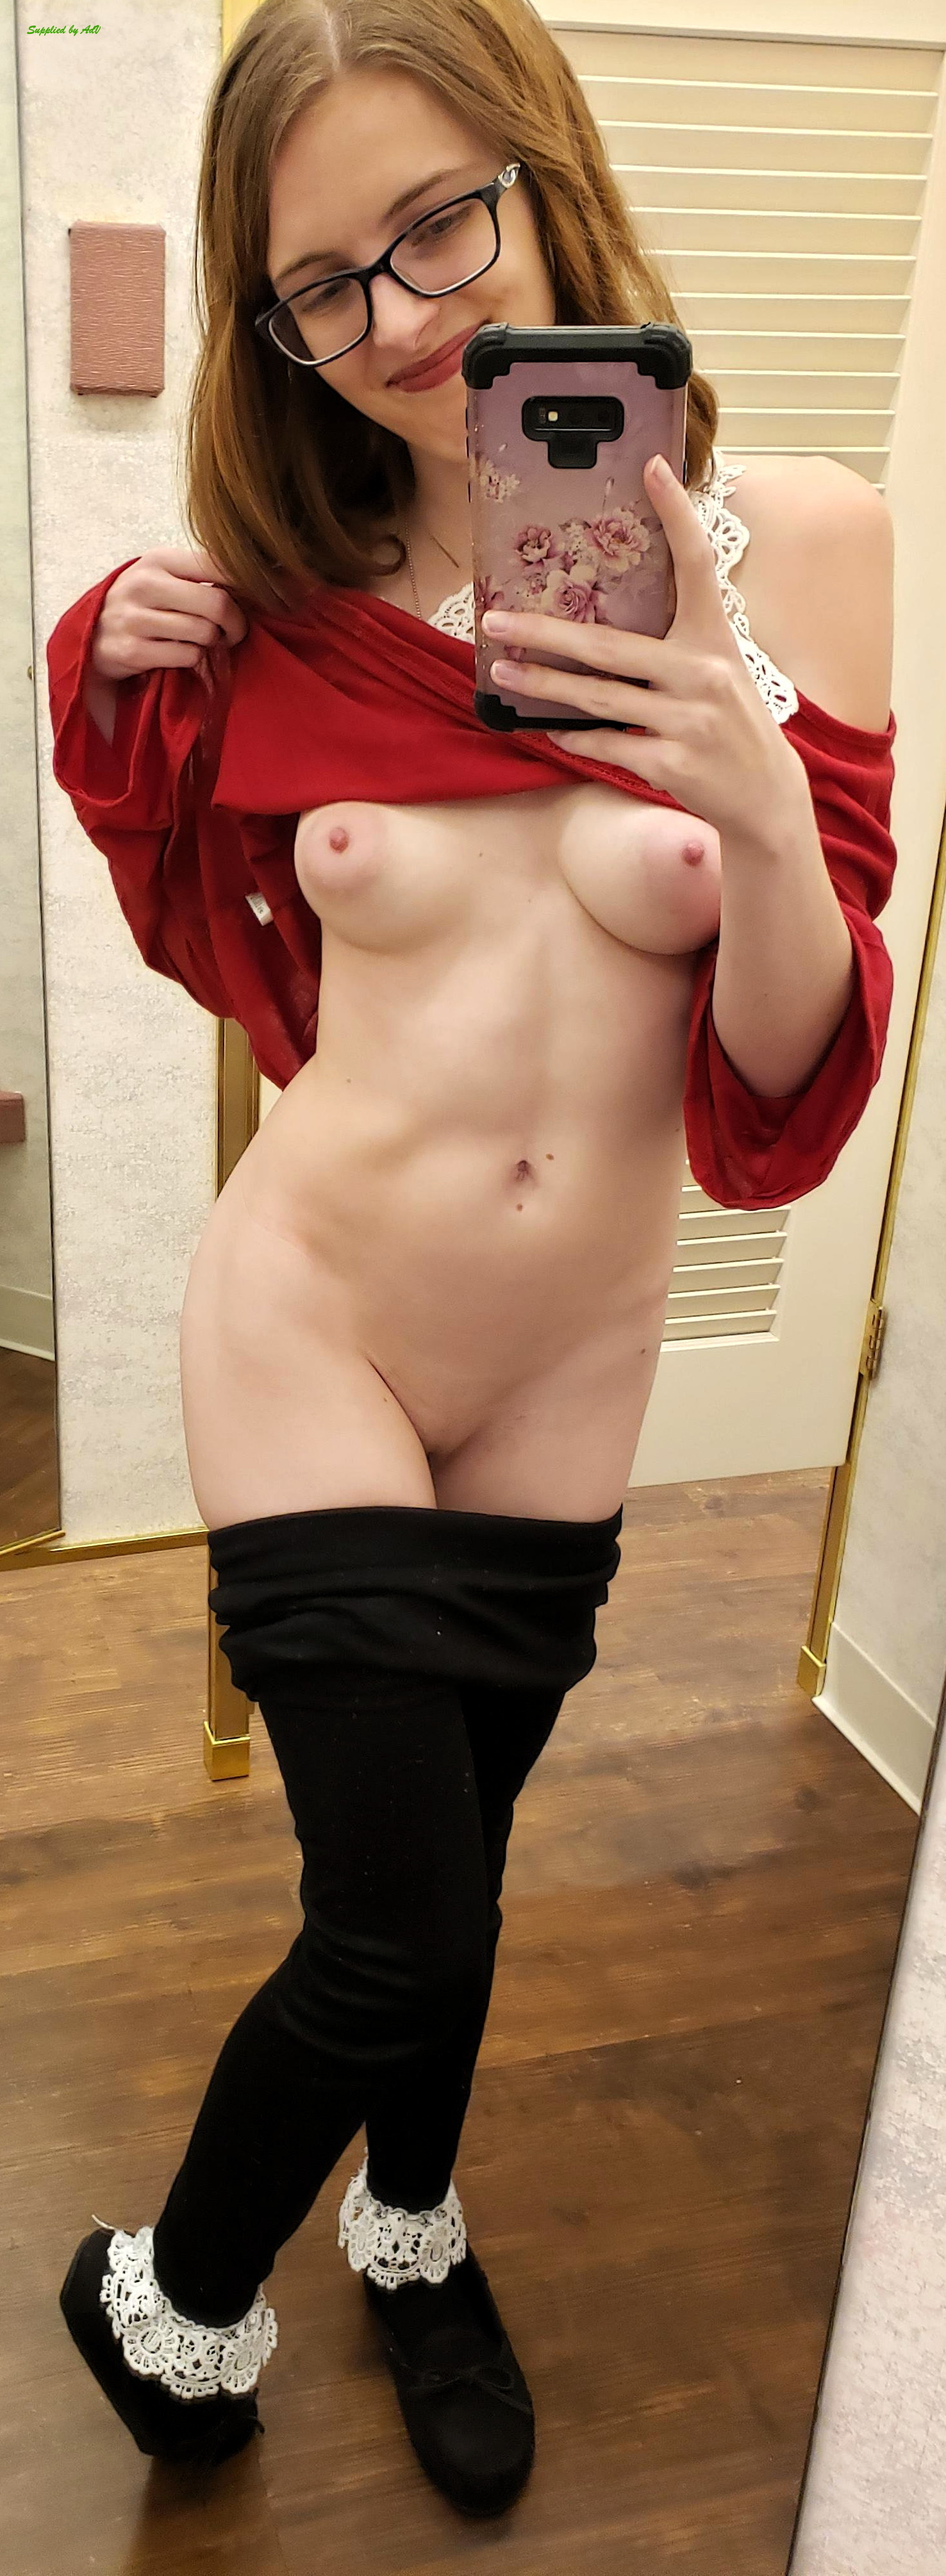 turn me into a sissy slut Glasses Nerd Plainjane Toppulledup Amateur